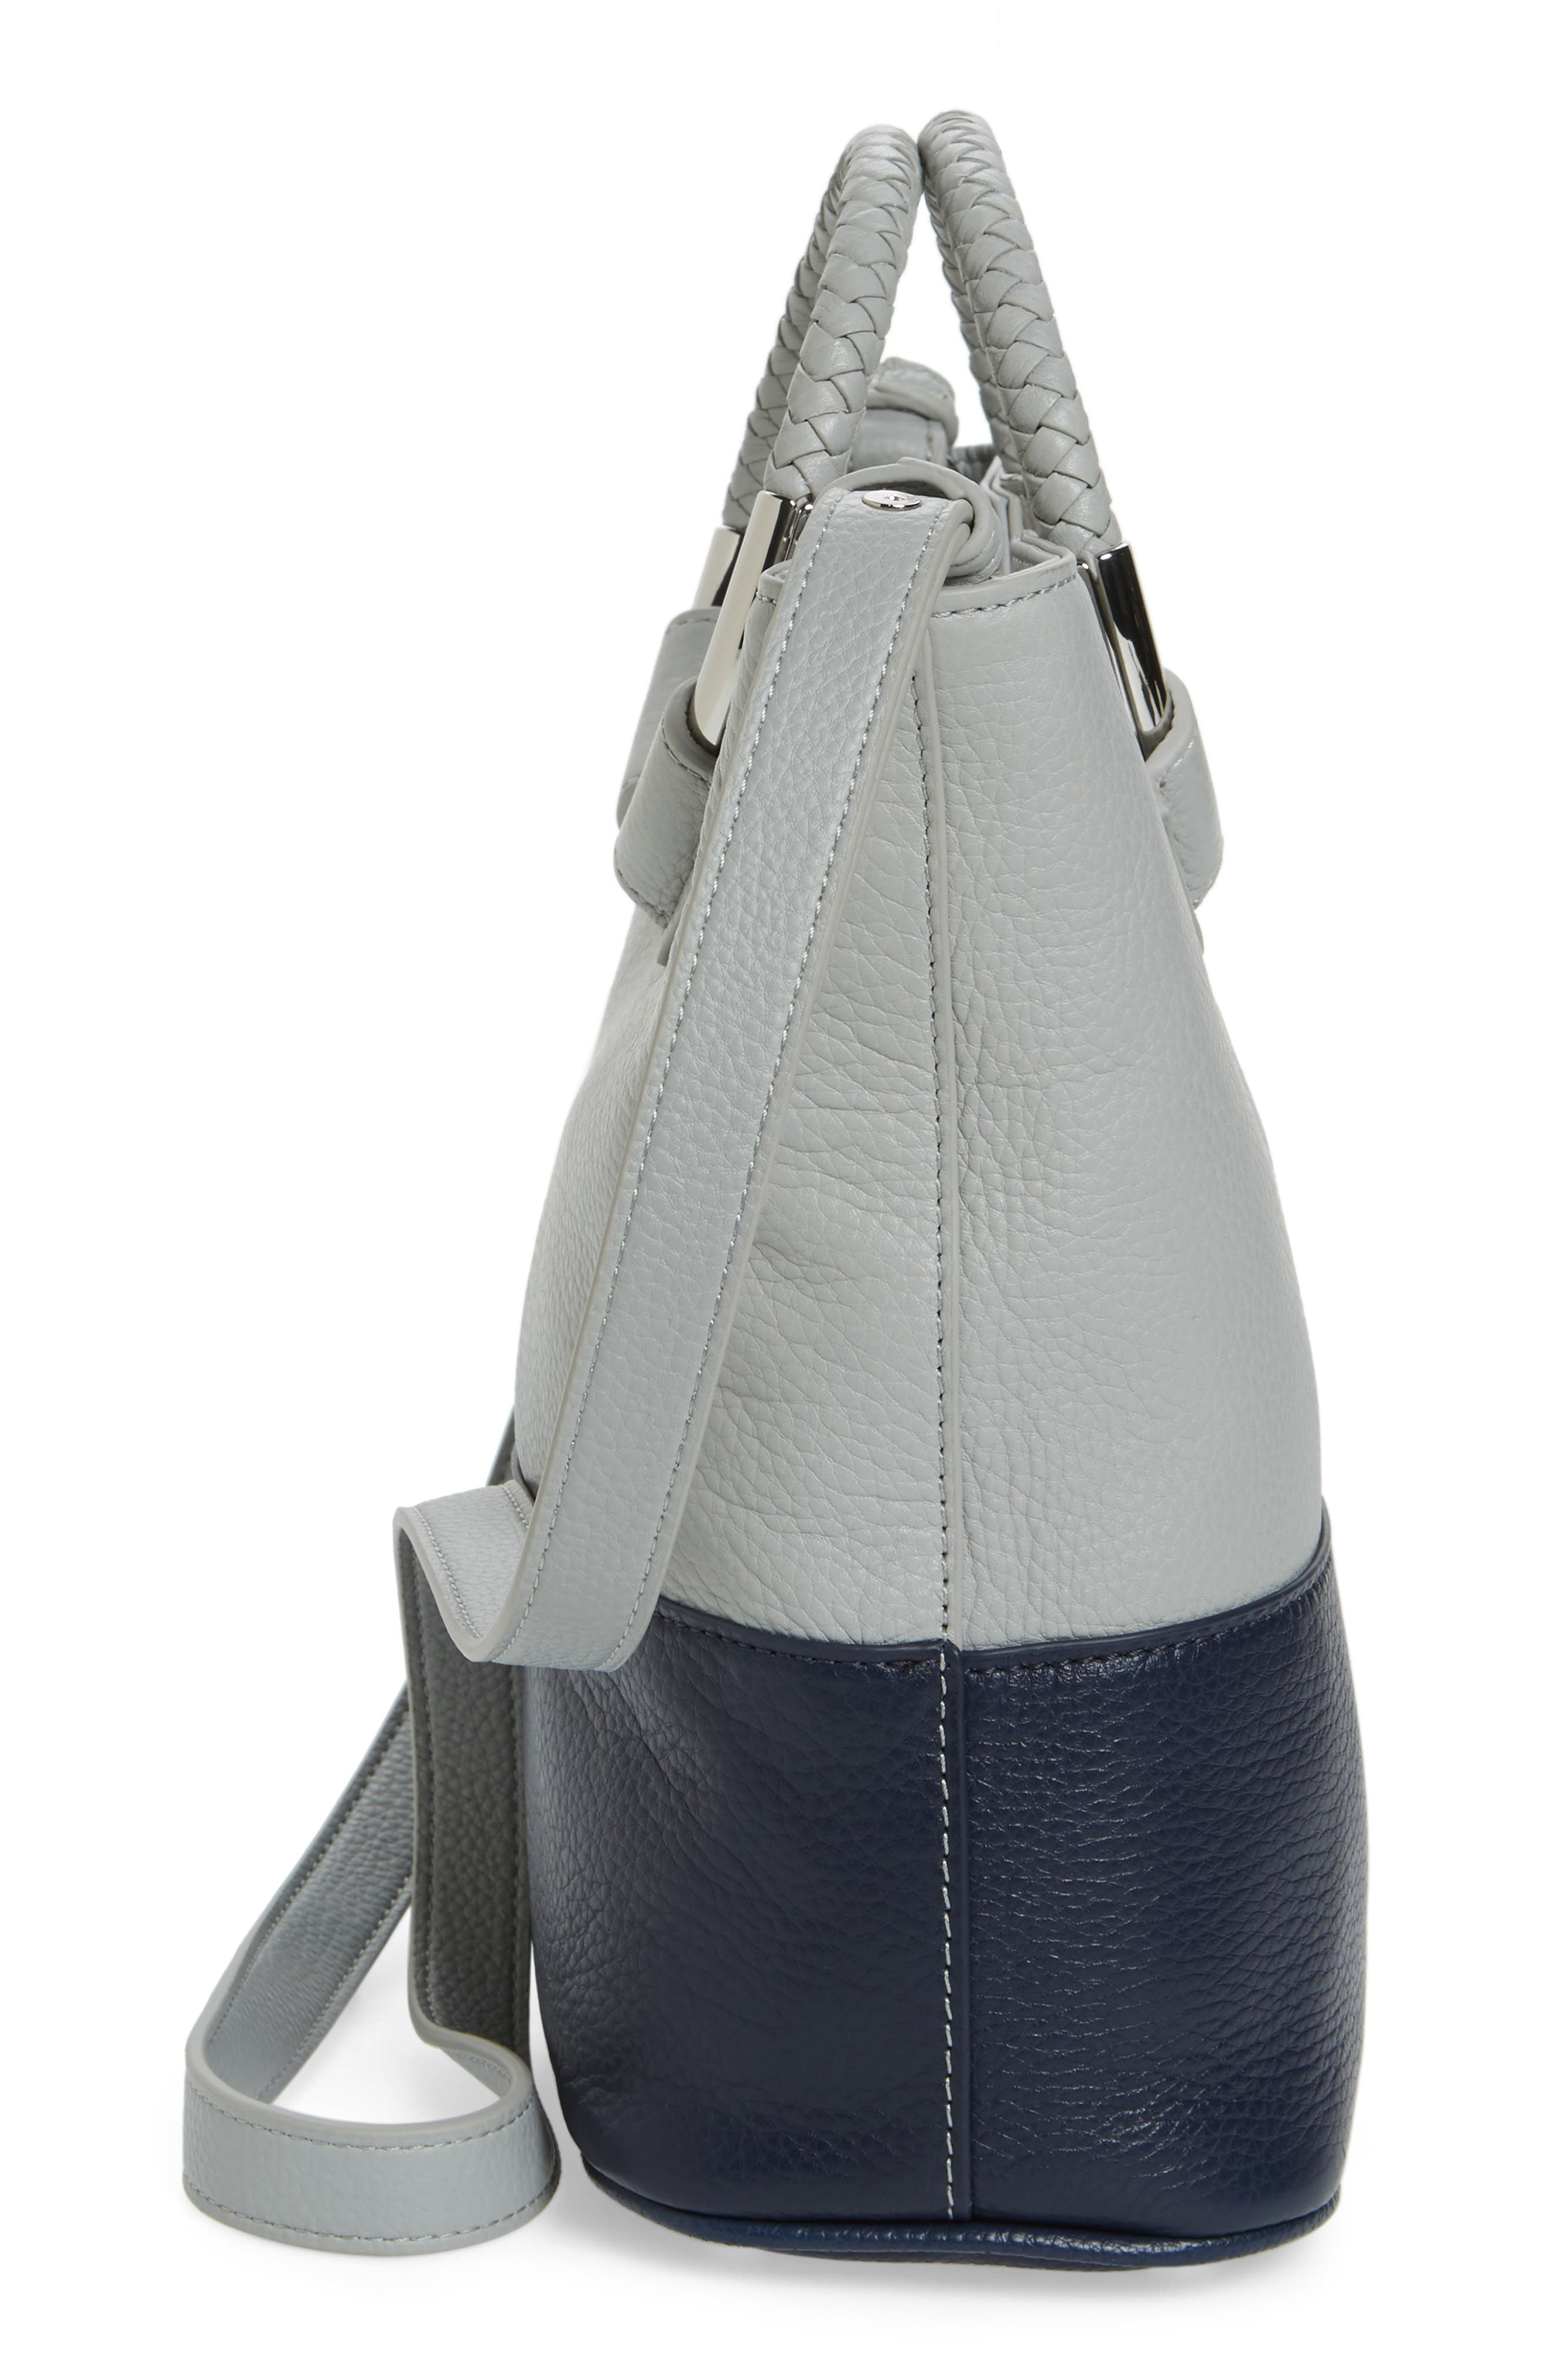 Small Elina Leather Crossbody Bag,                             Alternate thumbnail 5, color,                             Denim/ Ink Navy